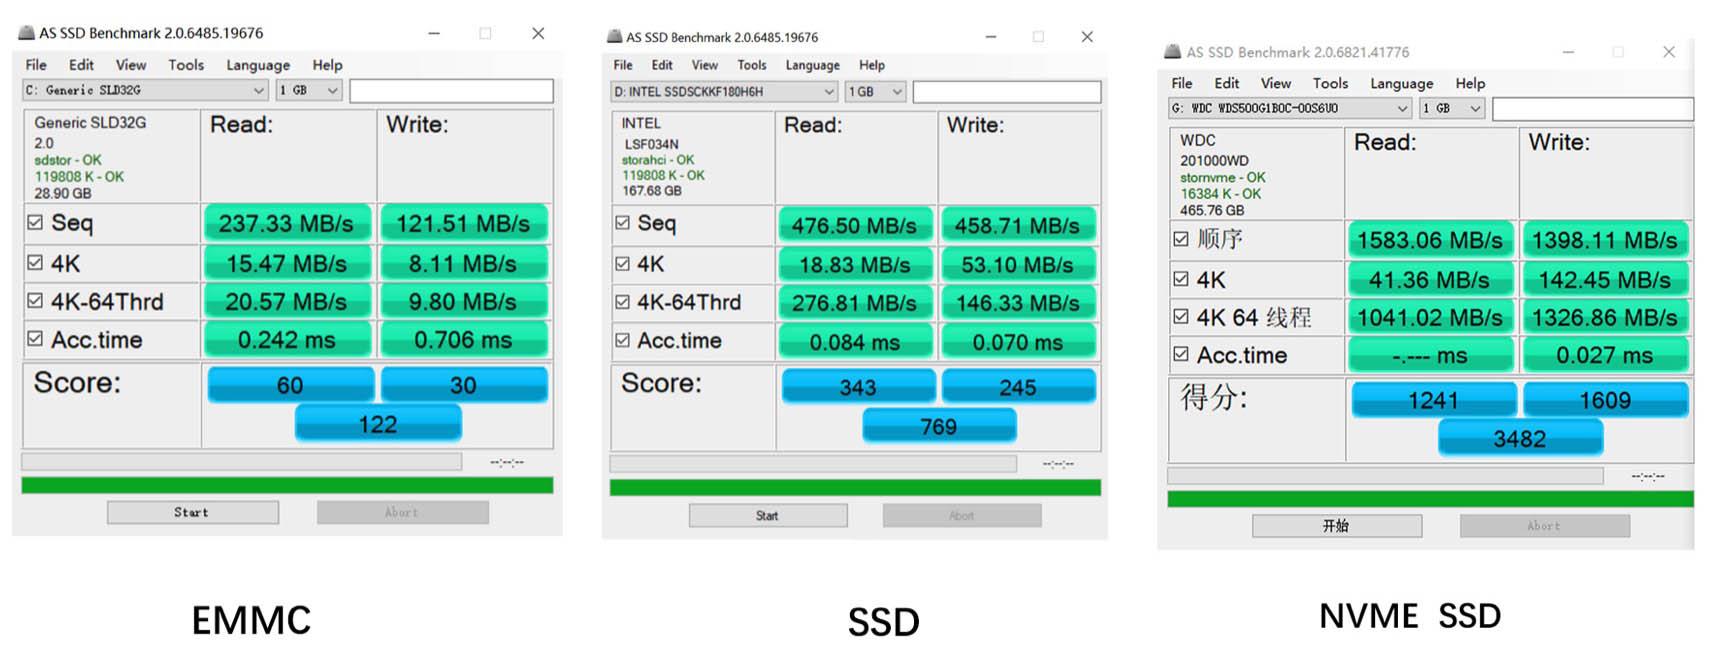 Diferencia velocidad eMMC vs SSD vs nvme SSD